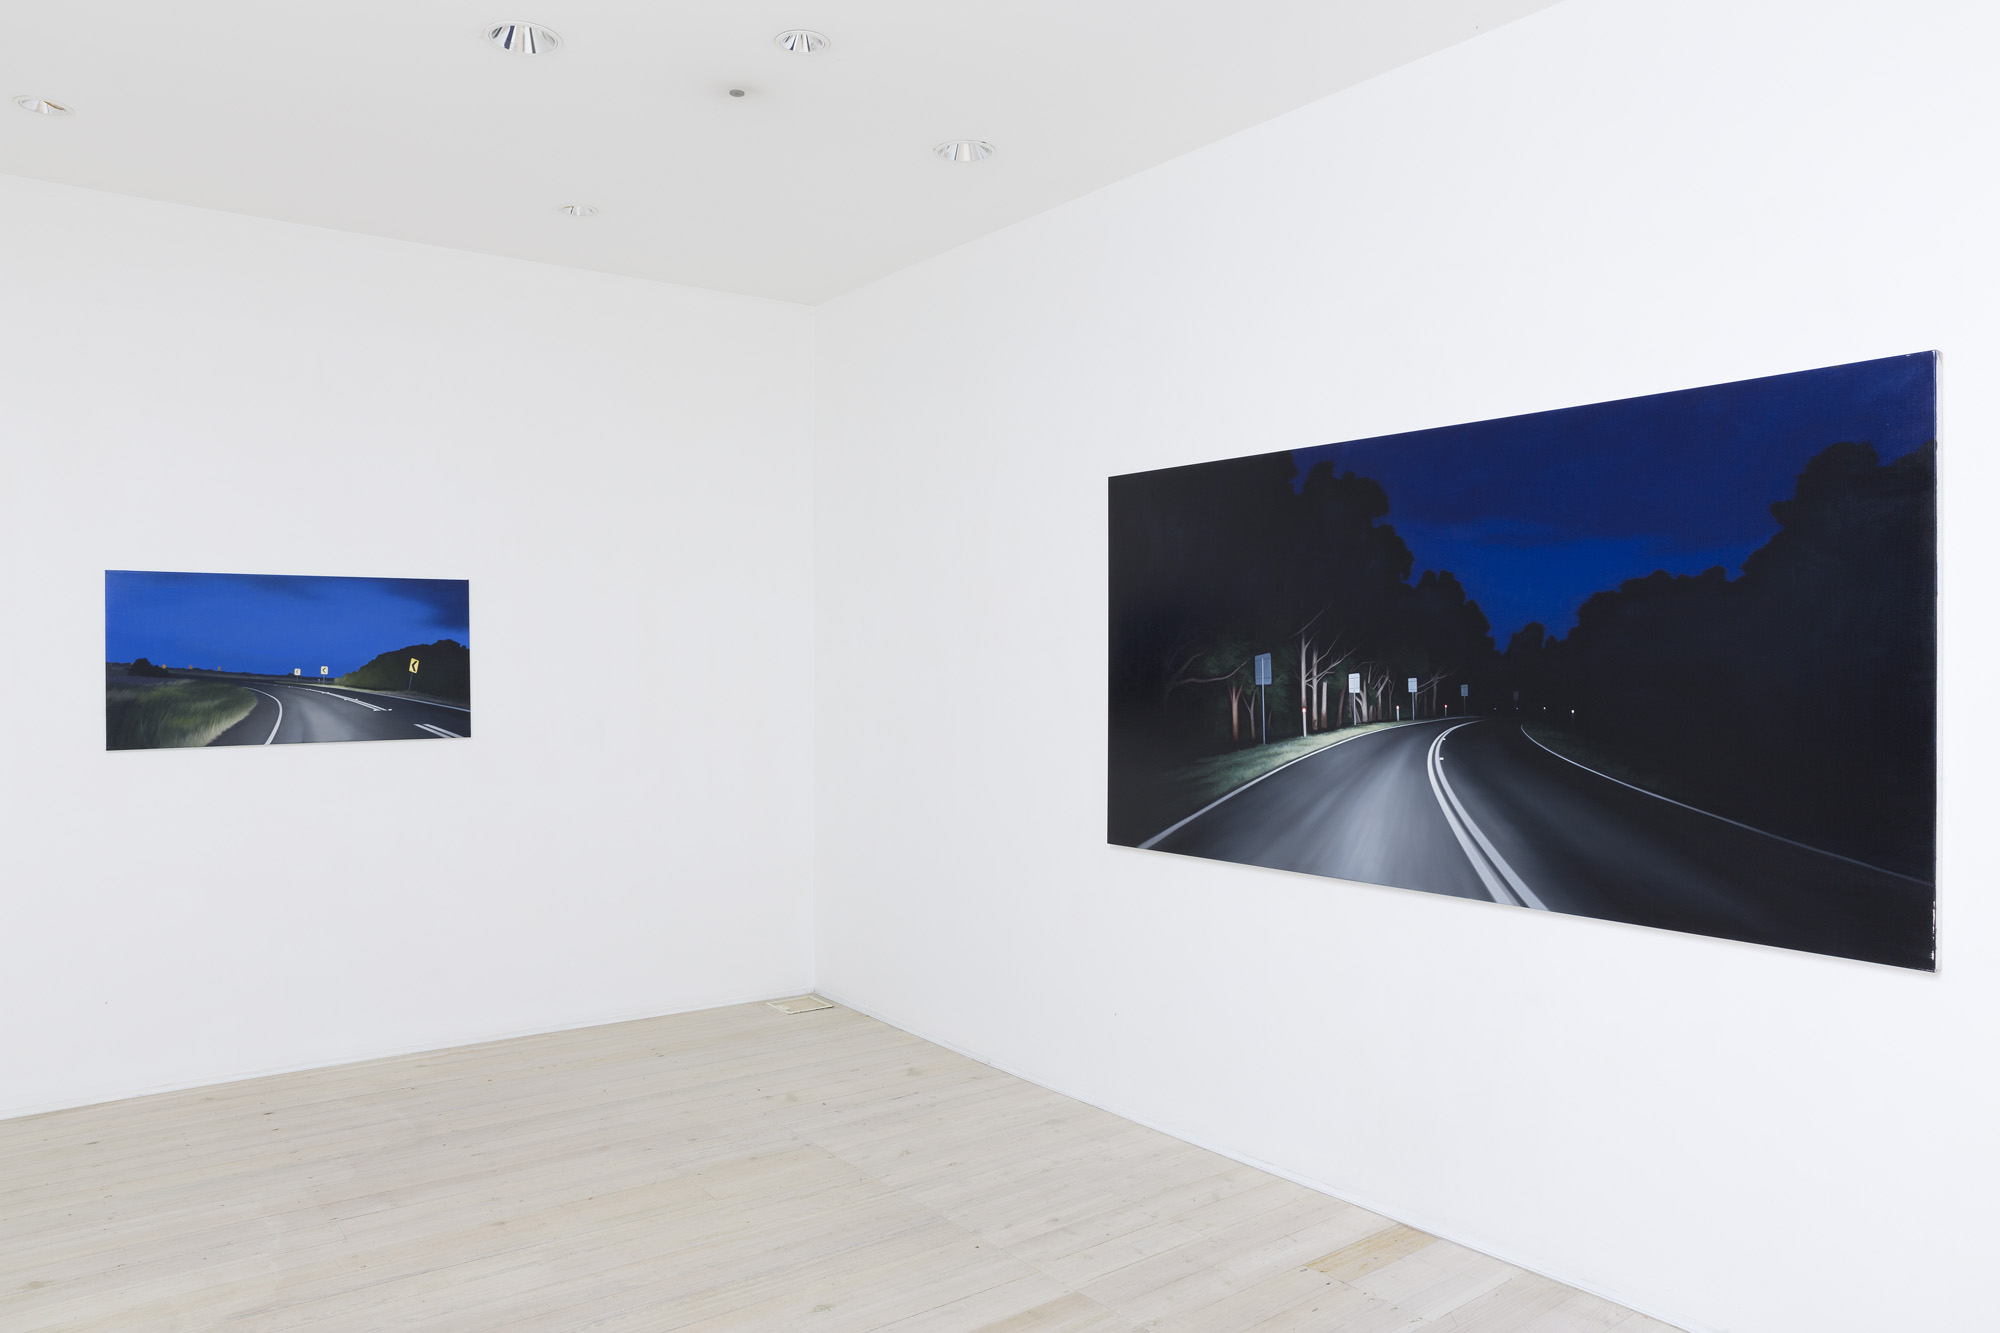 Tony Lloyd, exhibition view Gallery 9